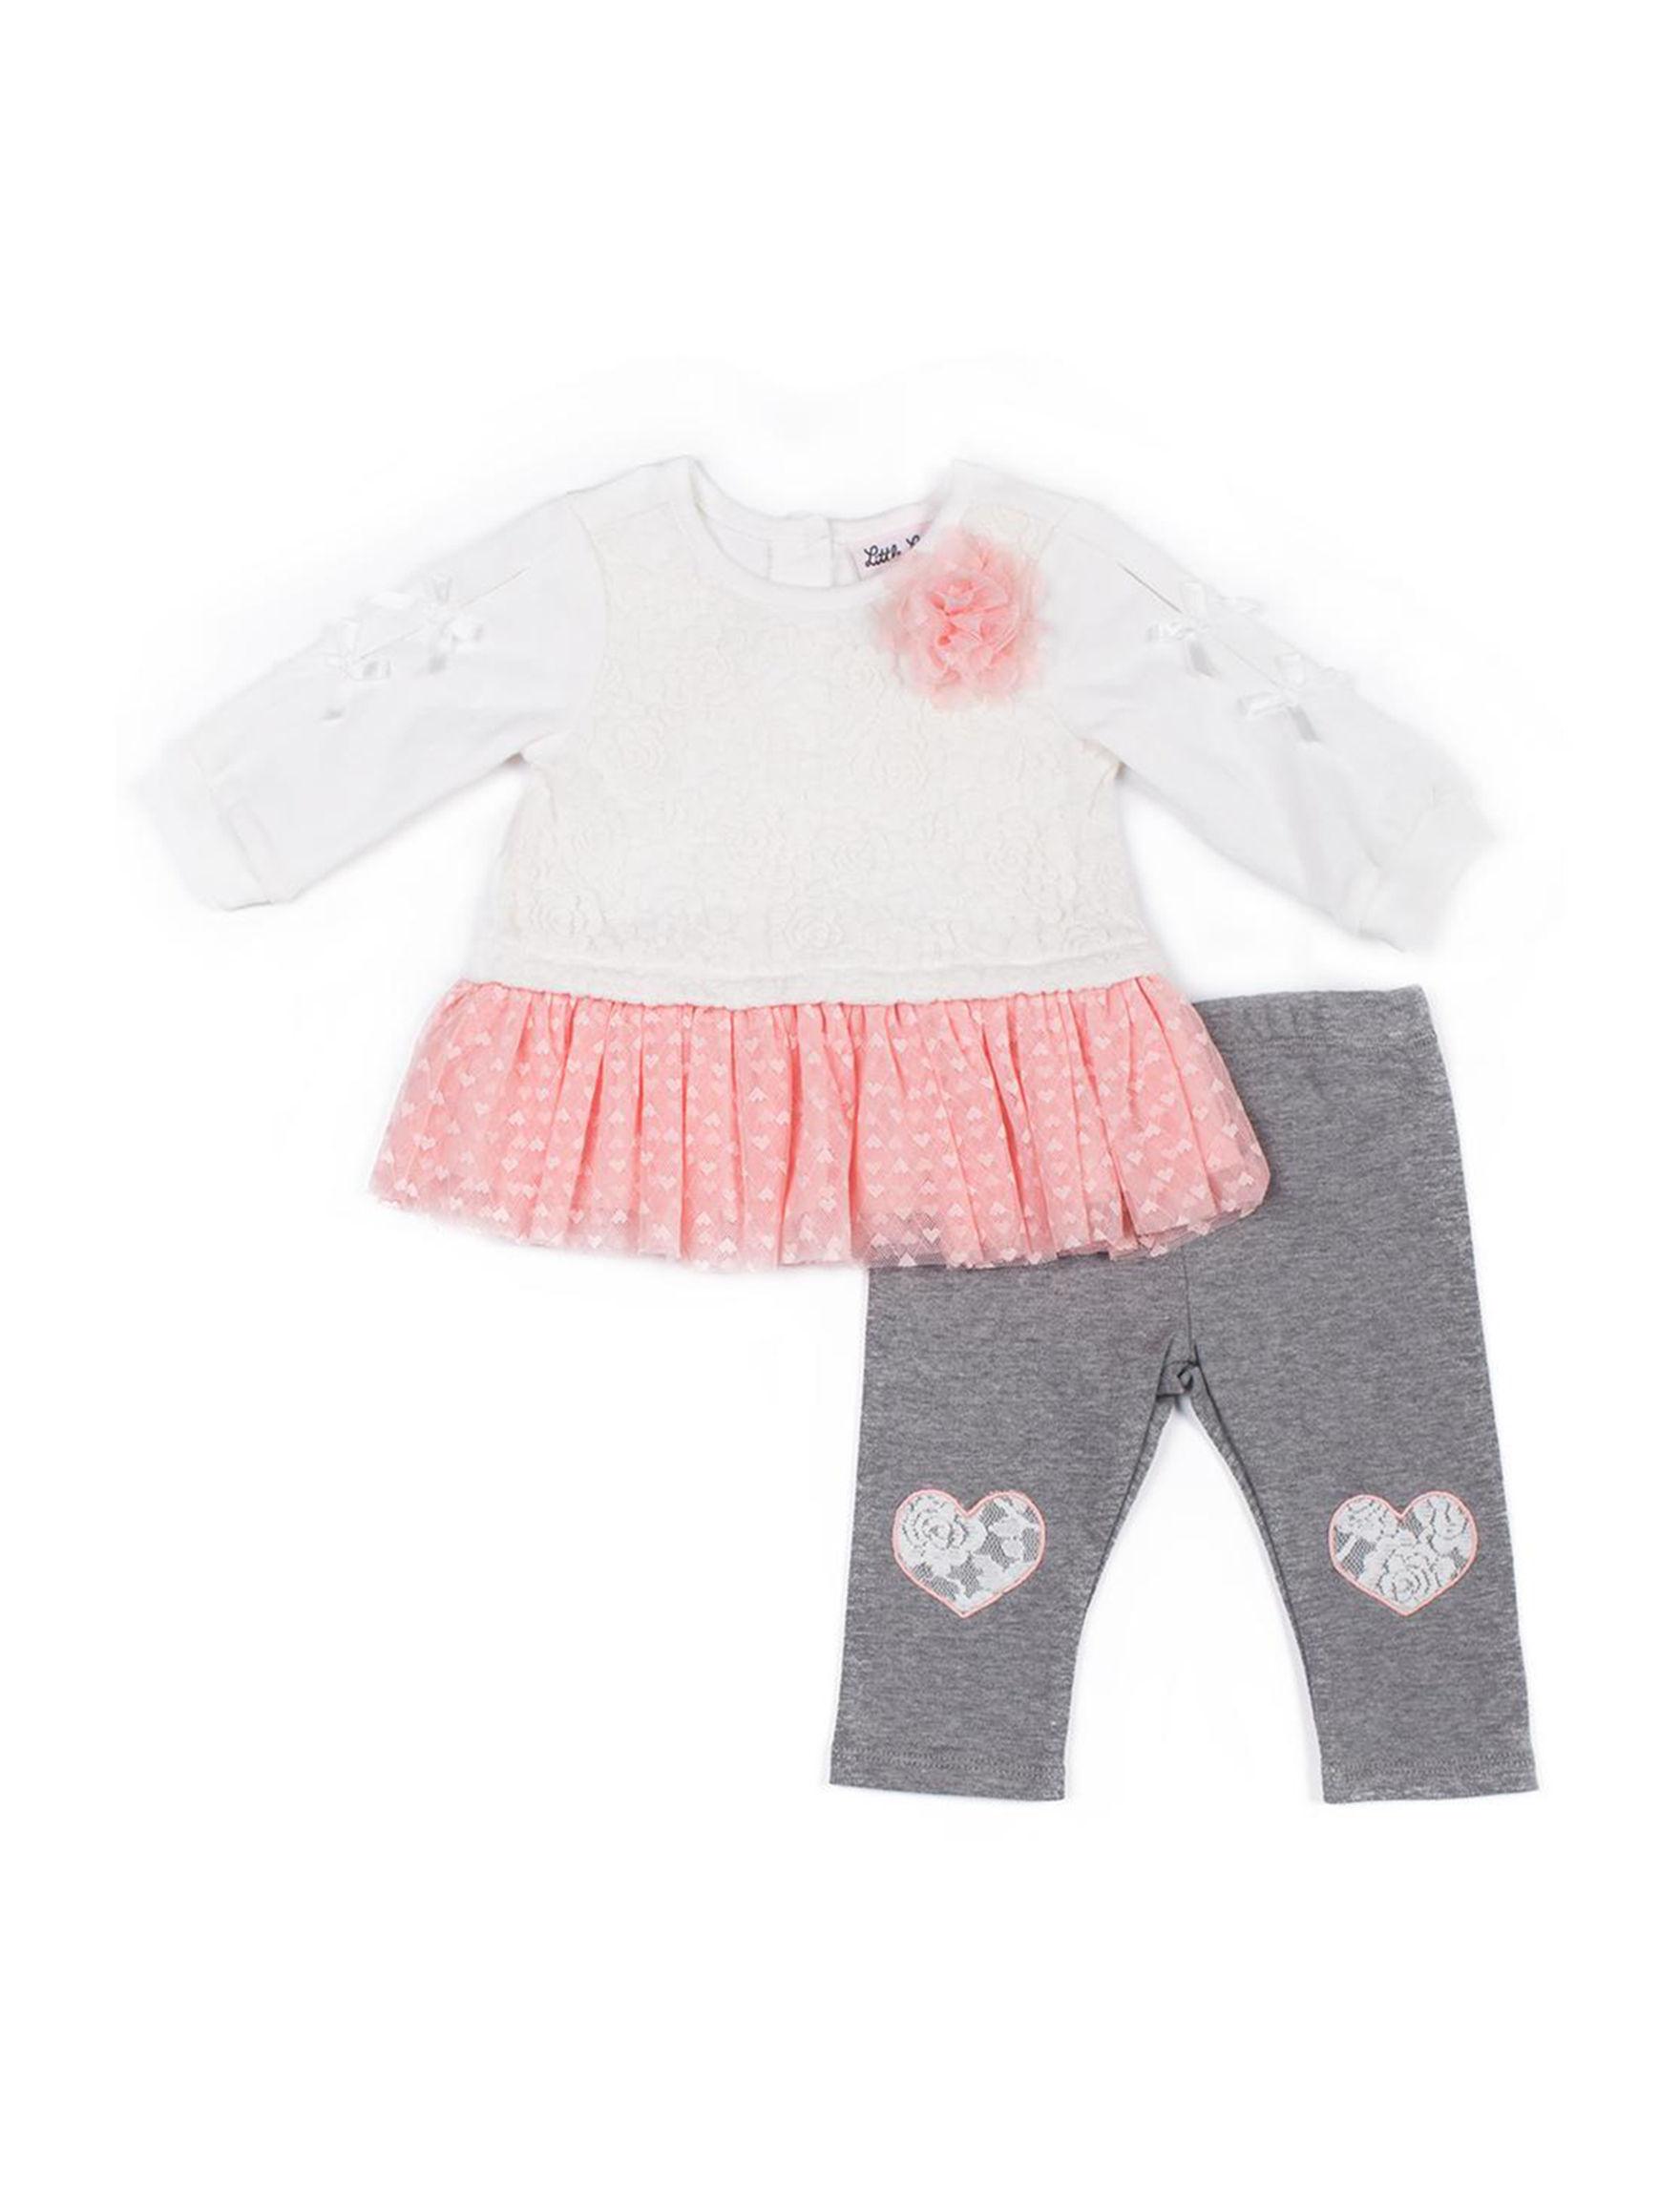 Little Lass White / Pink / Grey